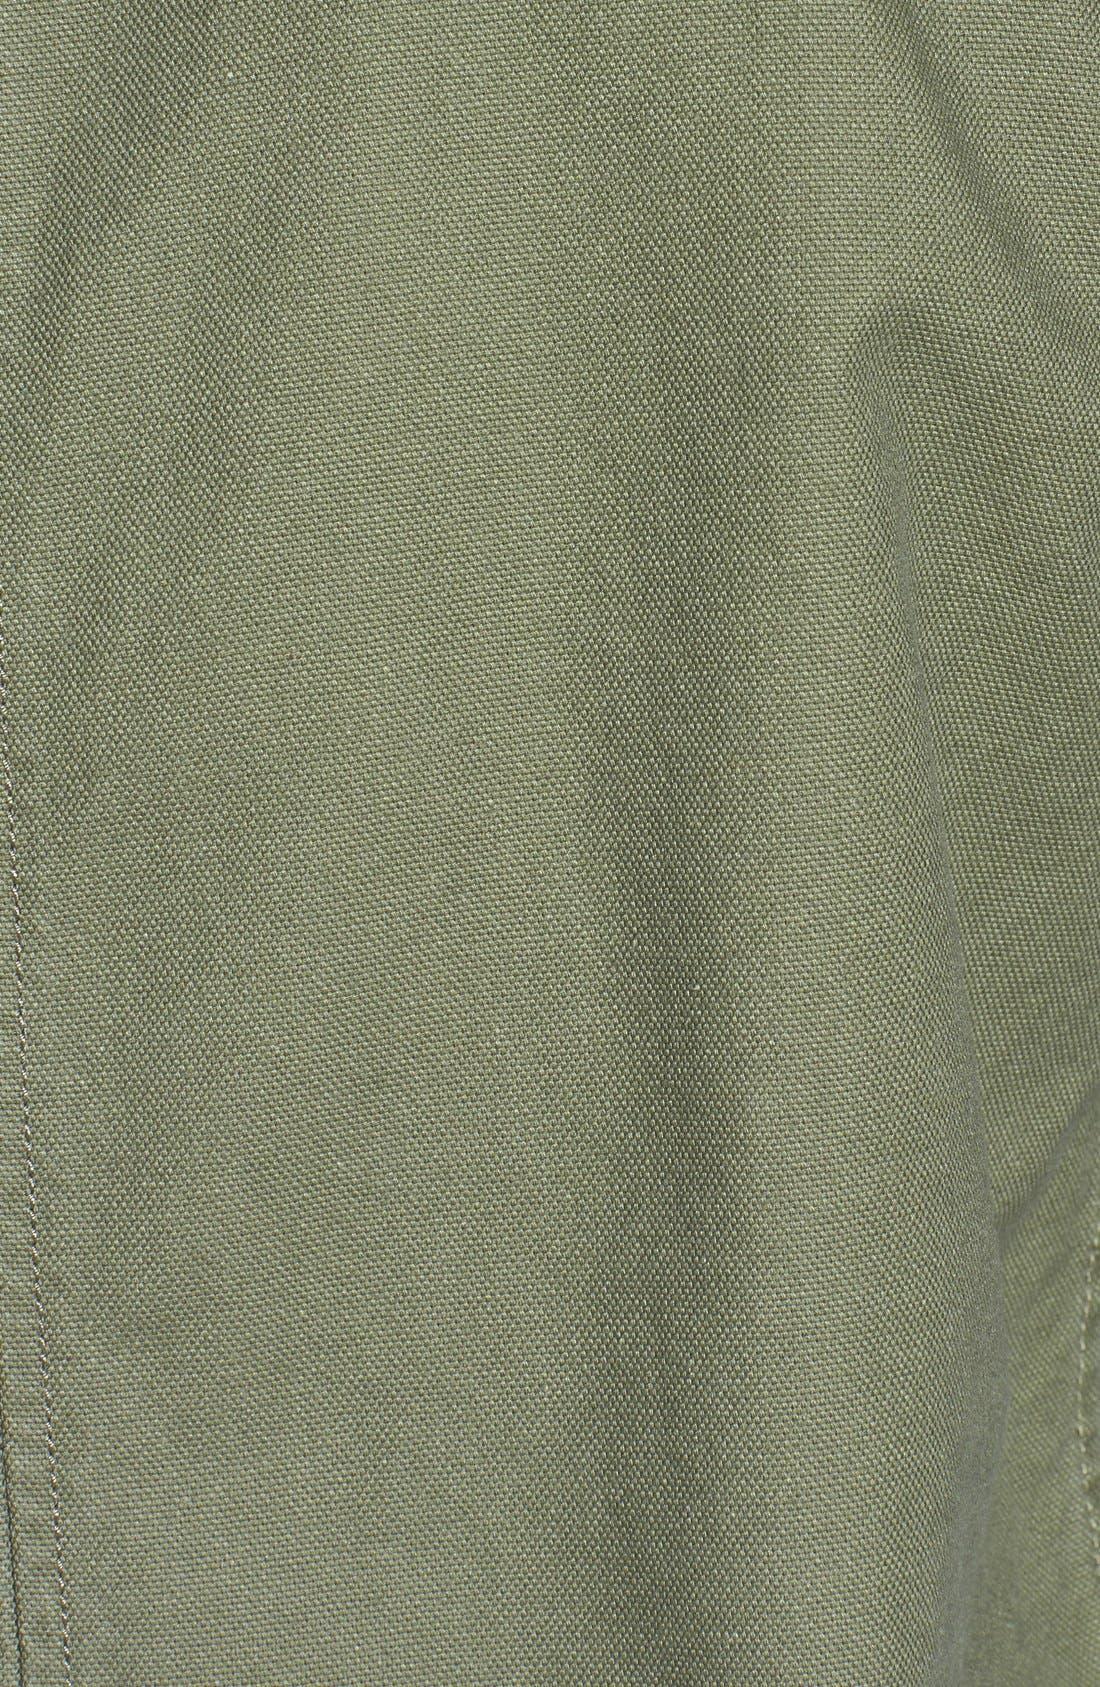 Alternate Image 2  - Timberland Coated Canvas Bomber Jacket (Online Only)